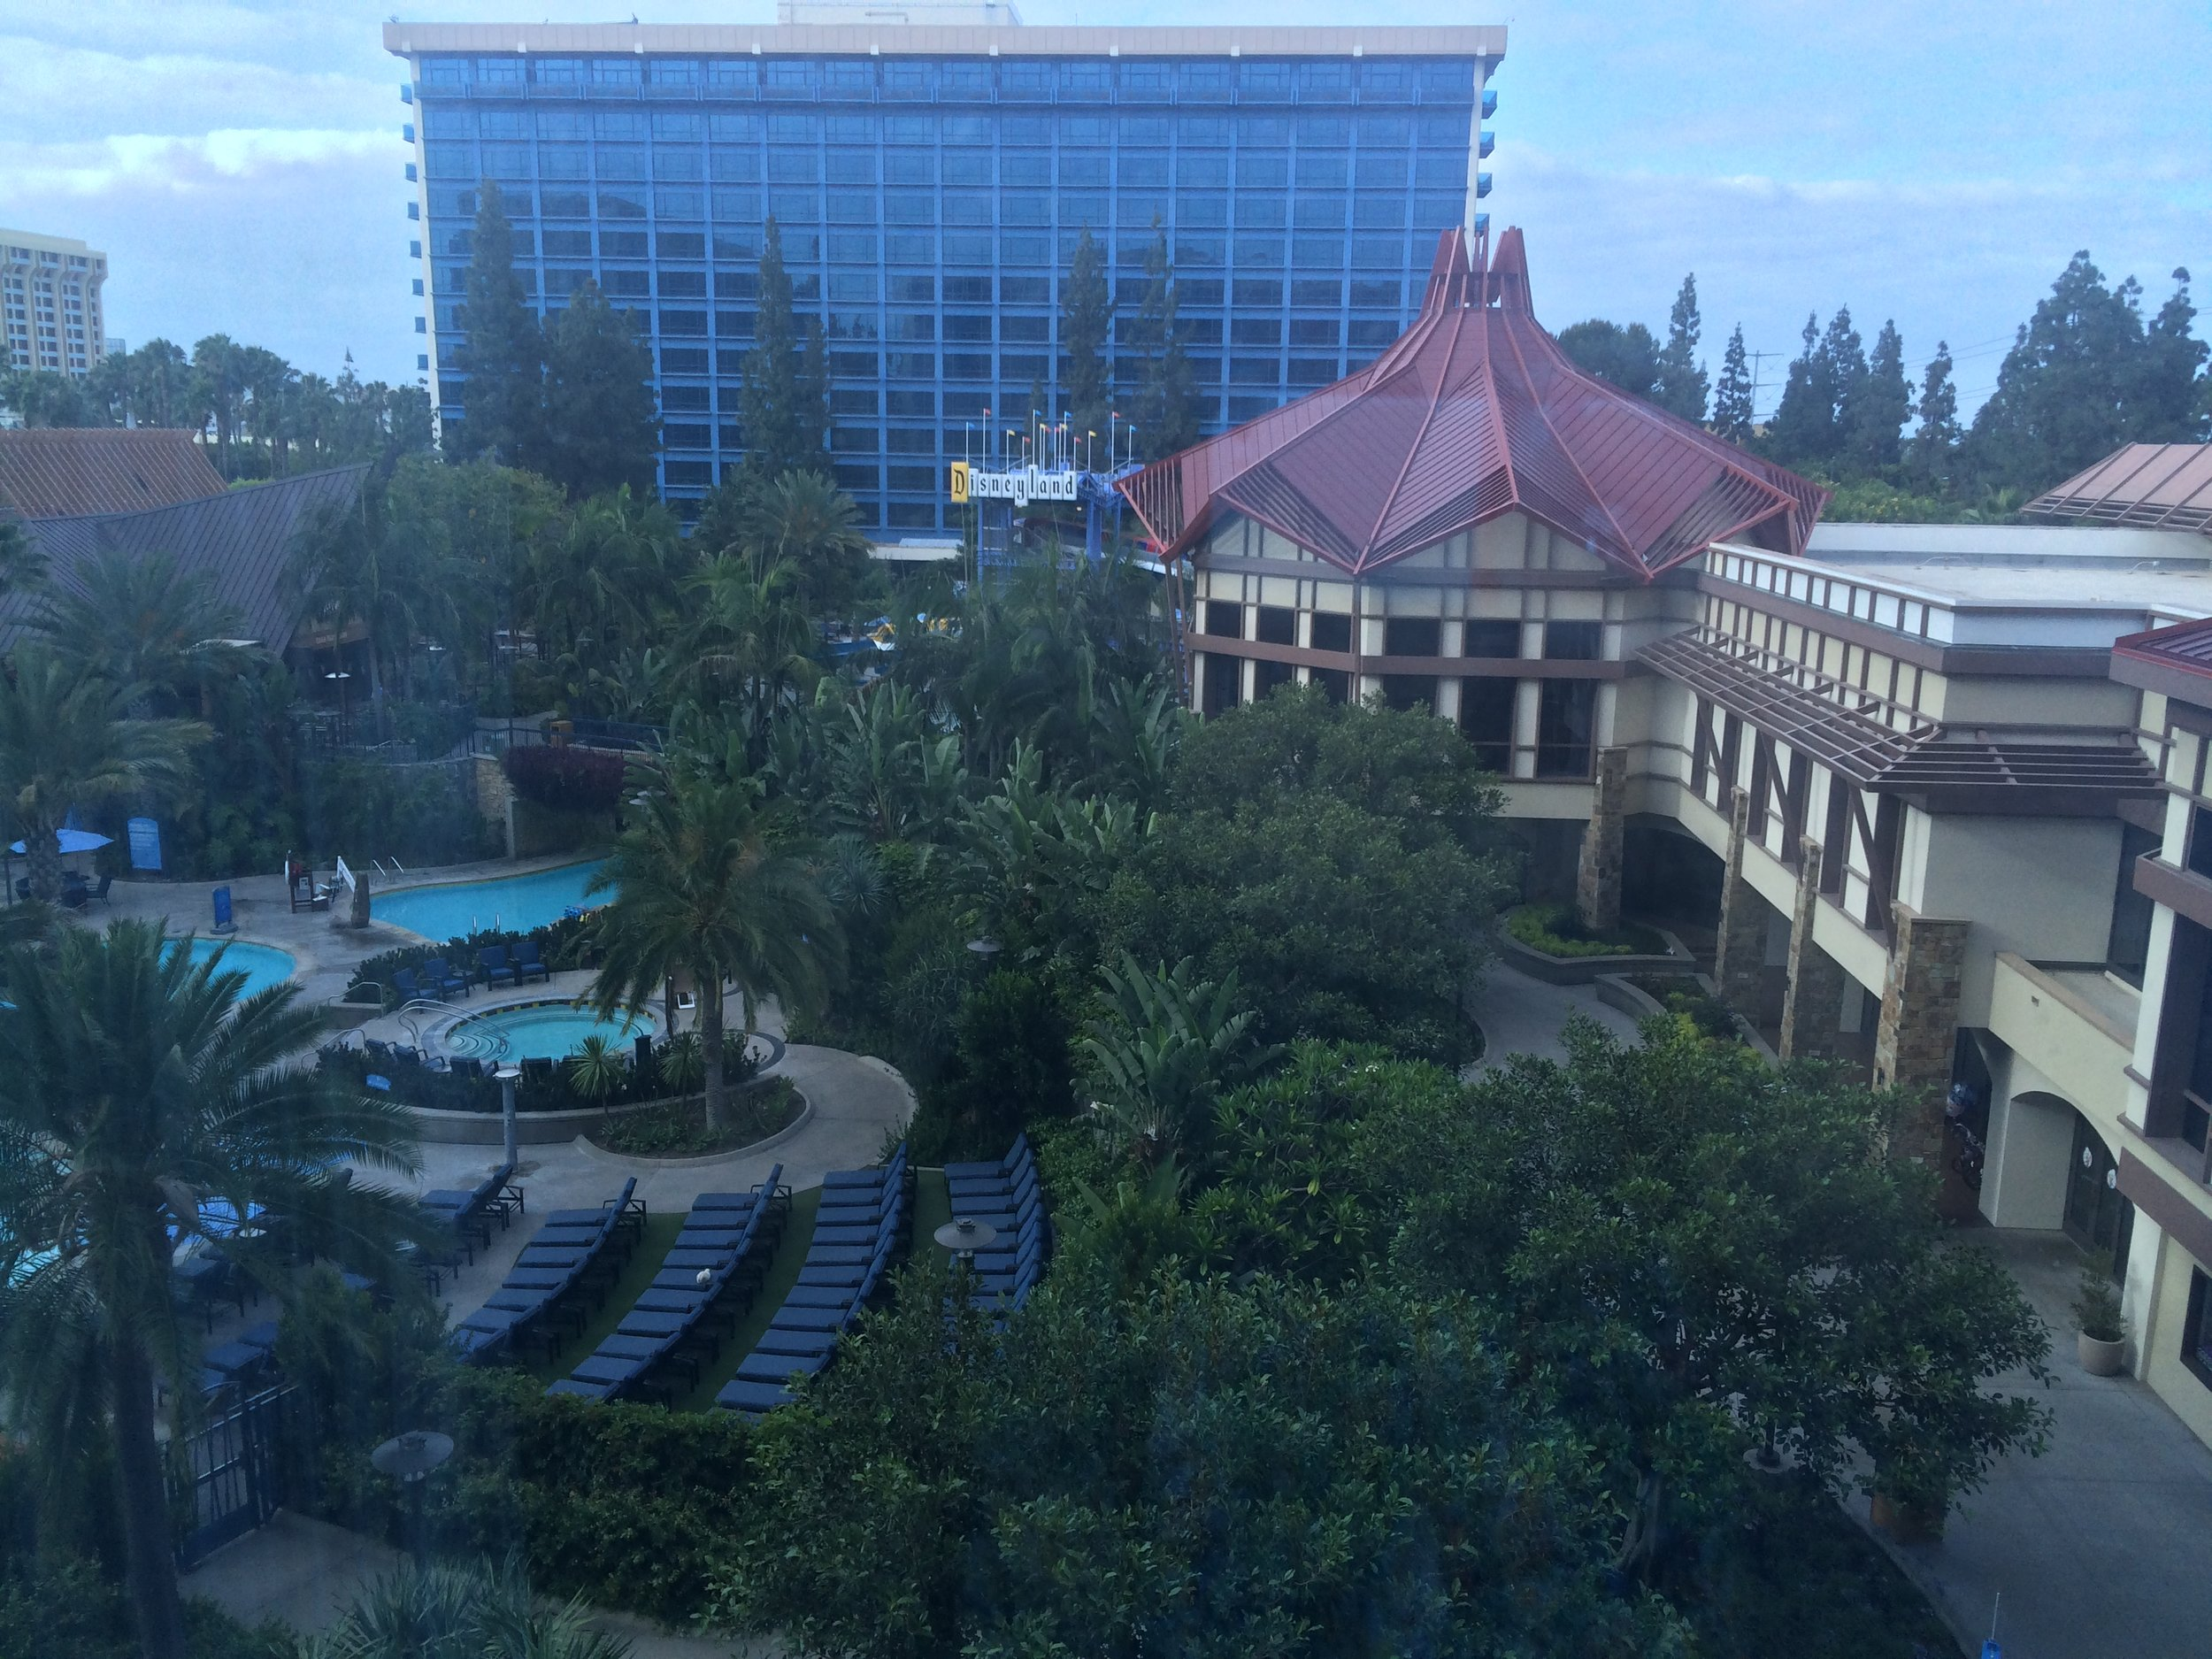 disneyland hotel aerial